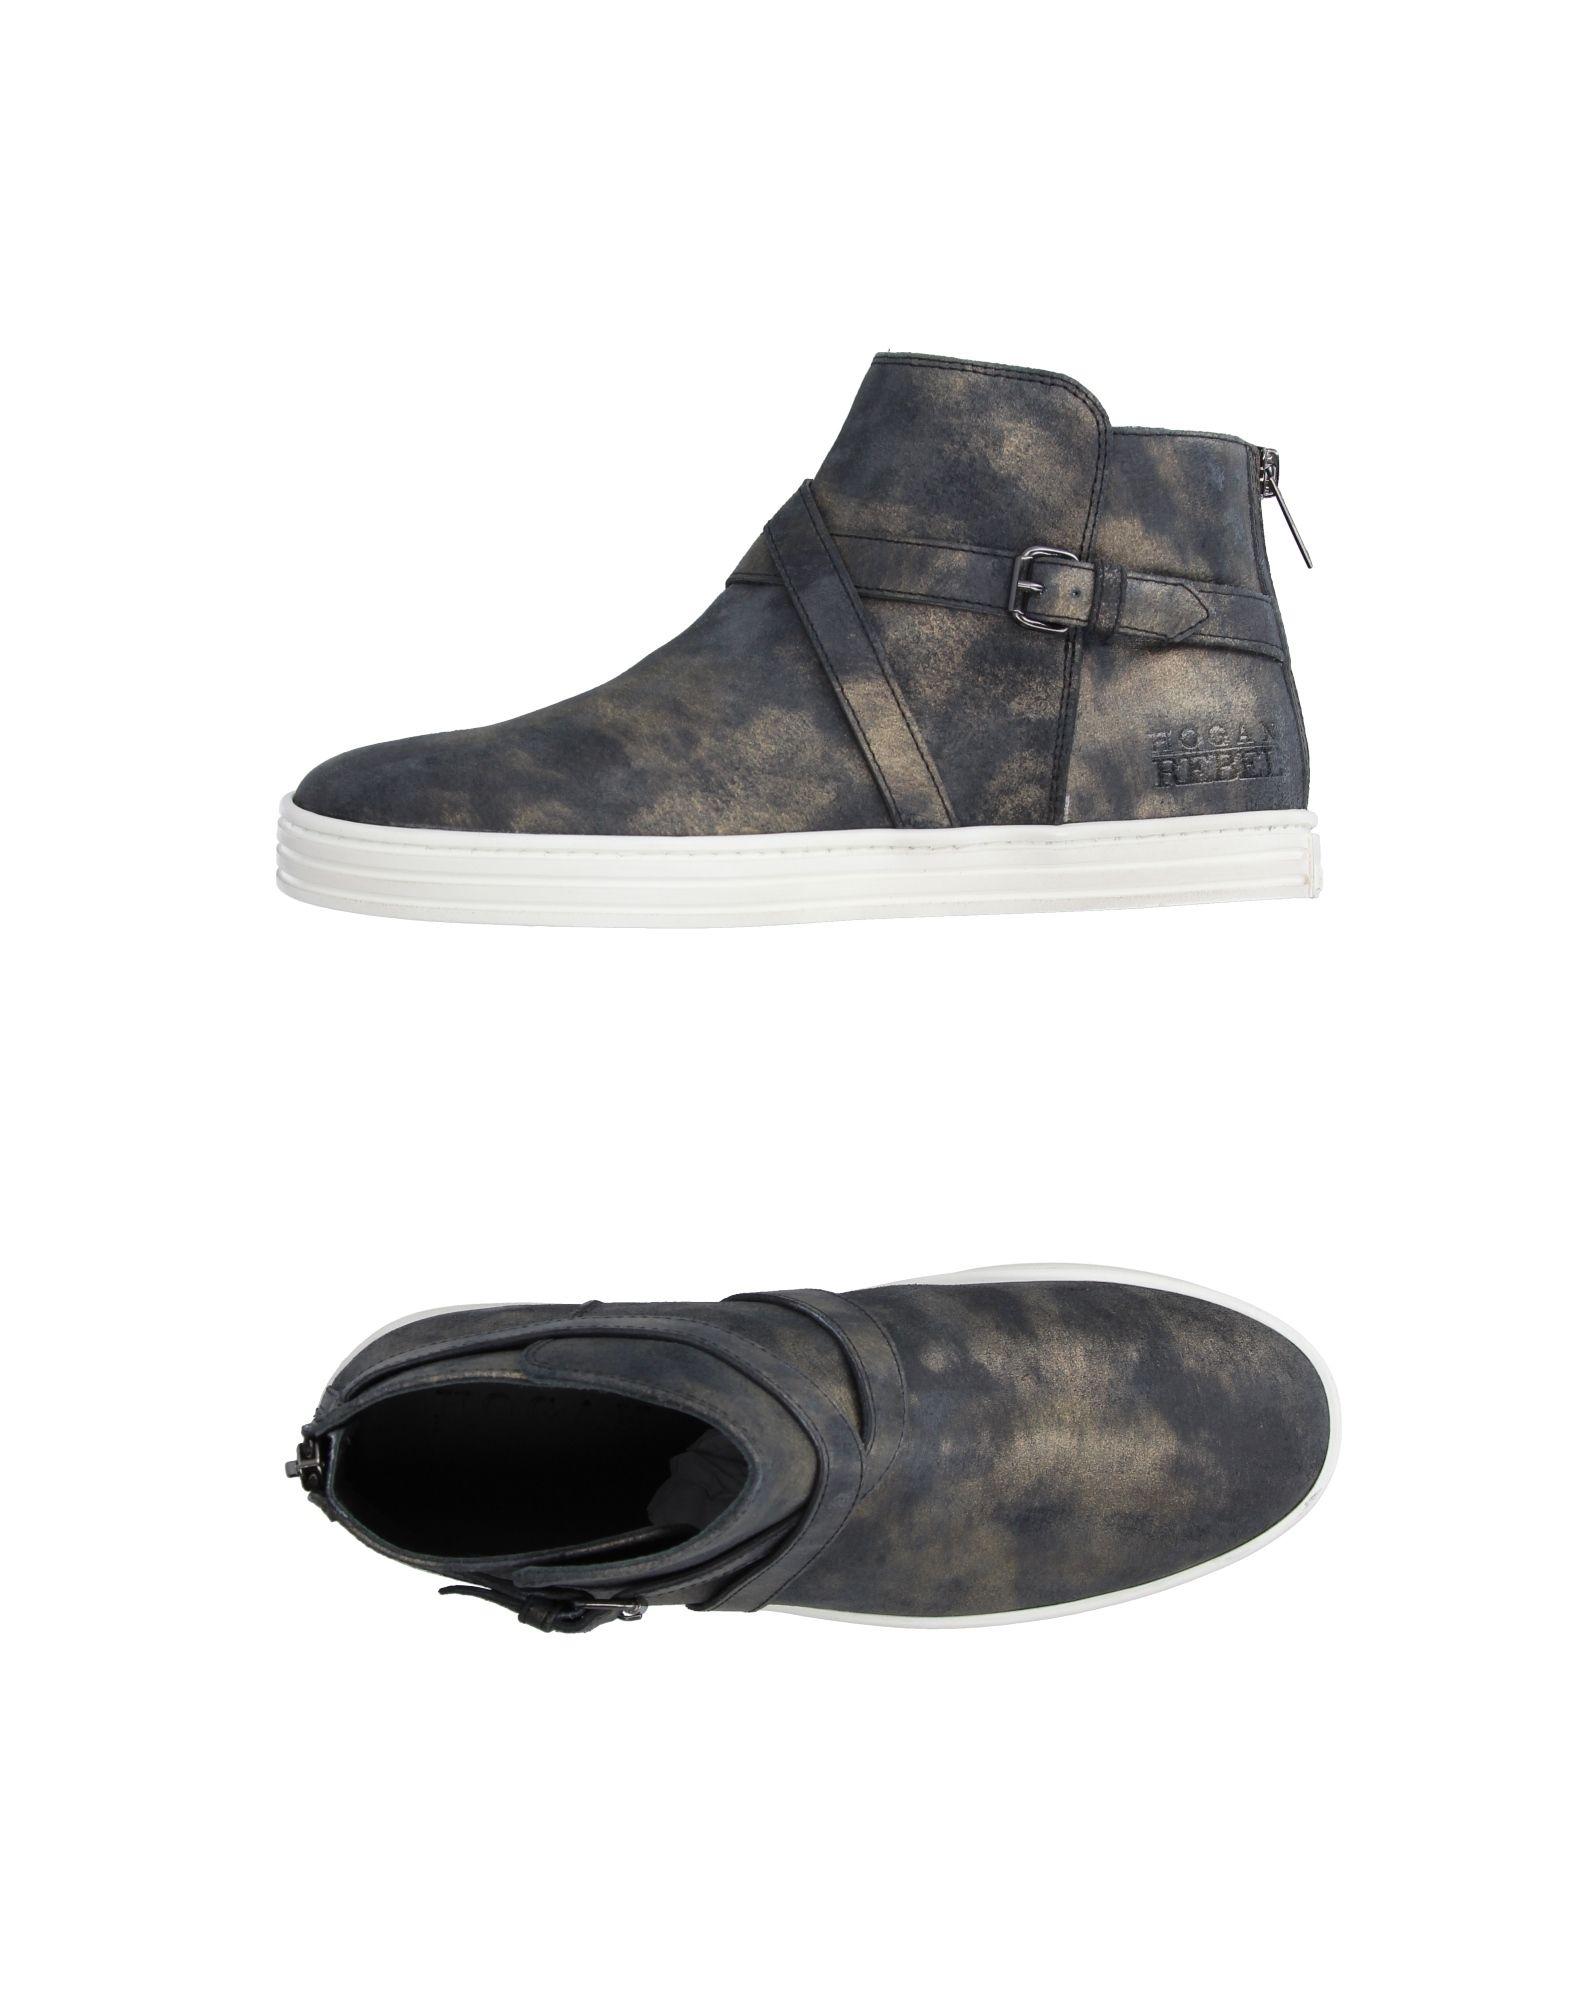 Stilvolle billige Schuhe  Hogan Rebel Sneakers Damen  Schuhe 11214266JM 85bcd7